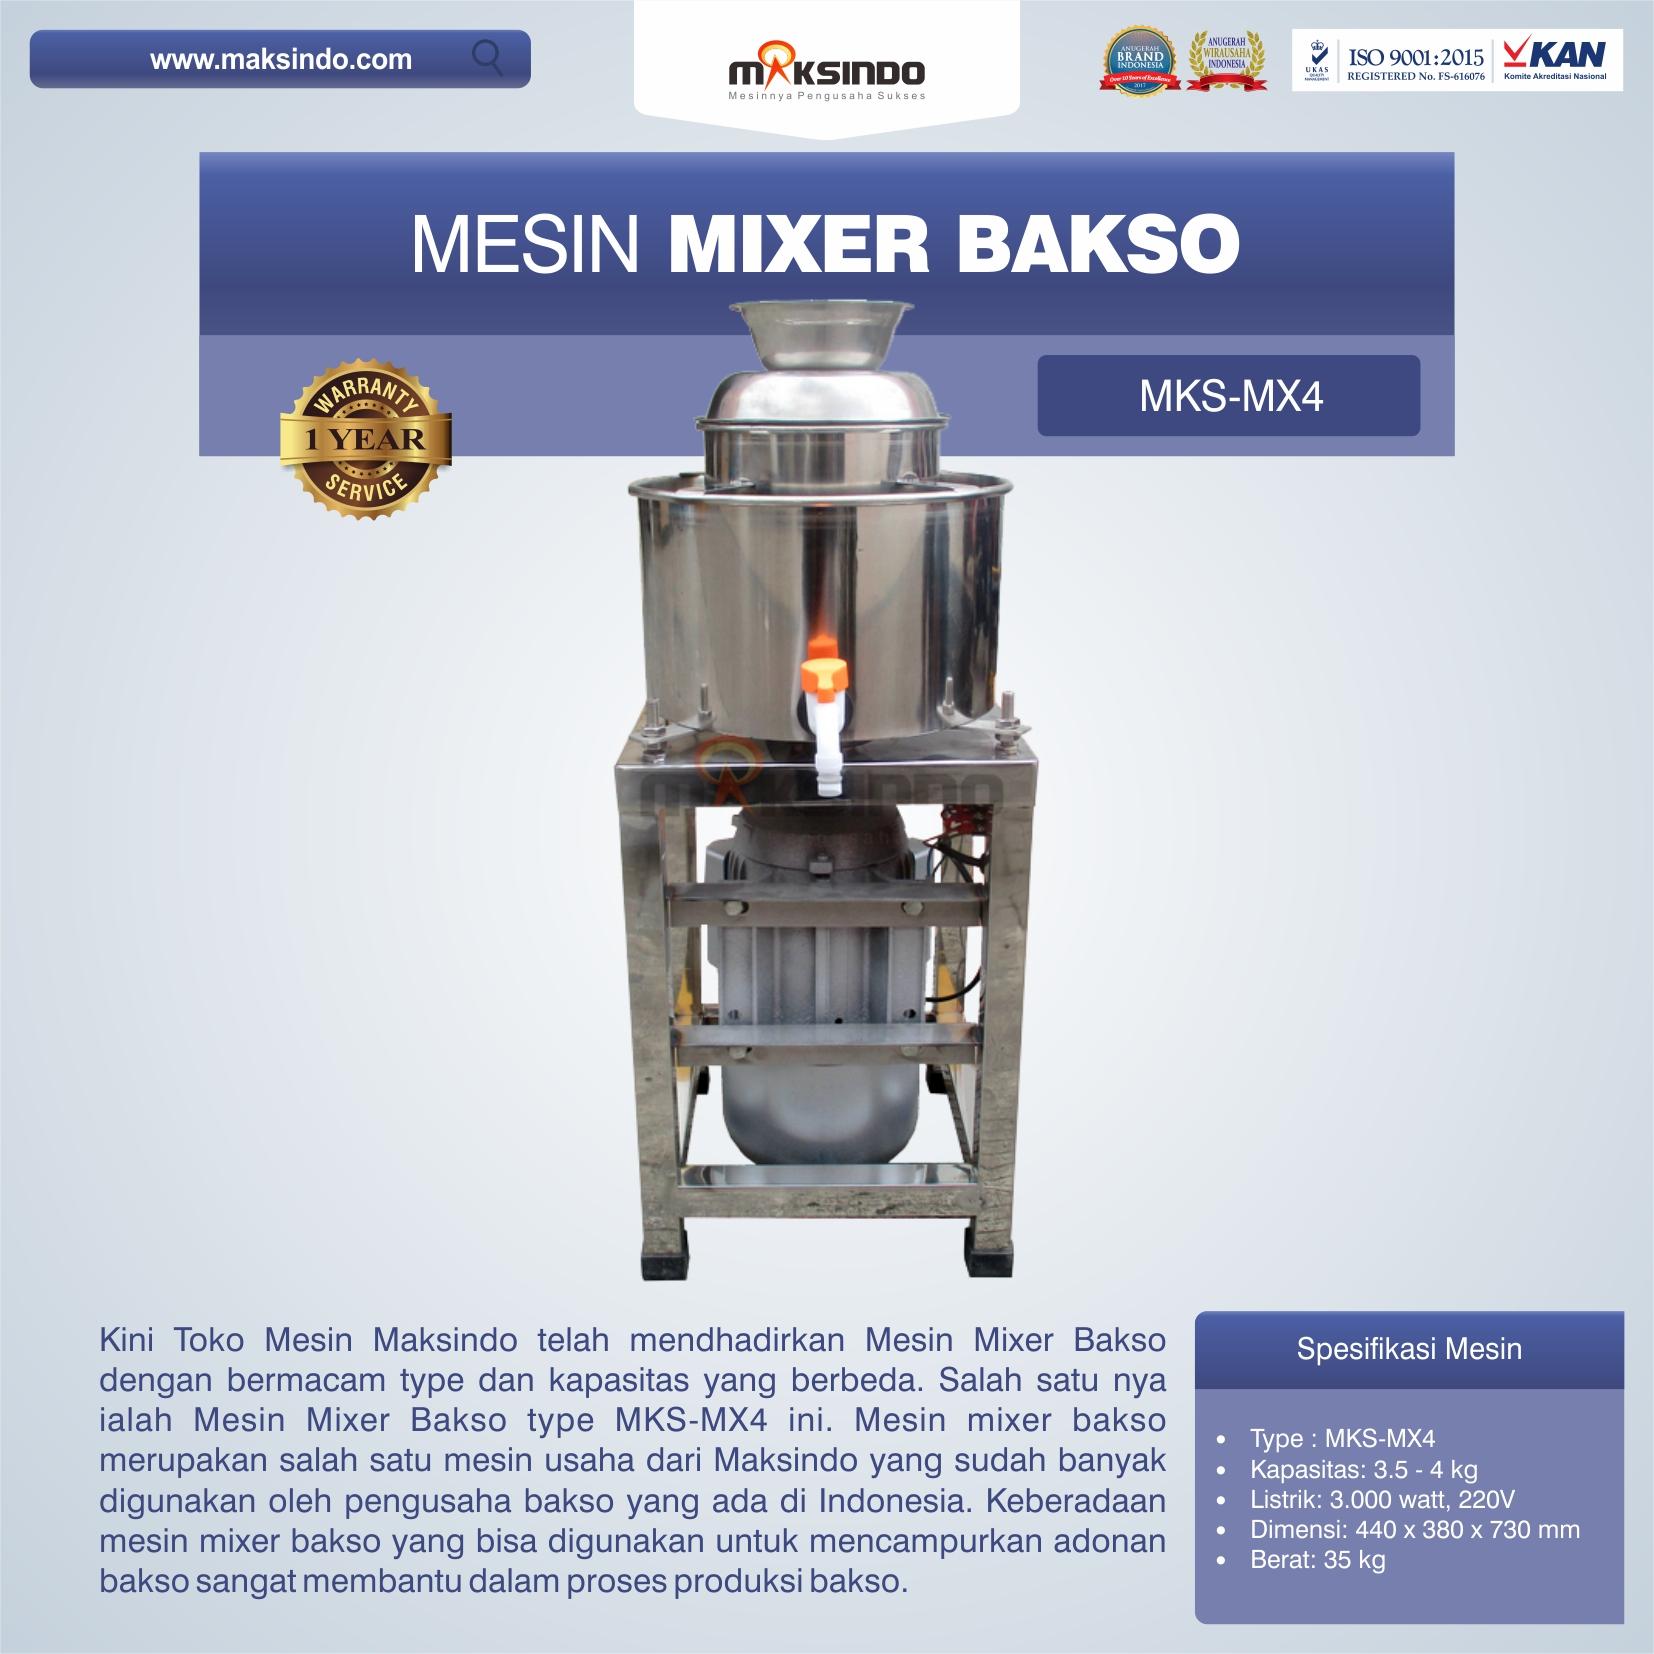 Jual Mesin Mixer Bakso MKS-MX4 di Bekasi